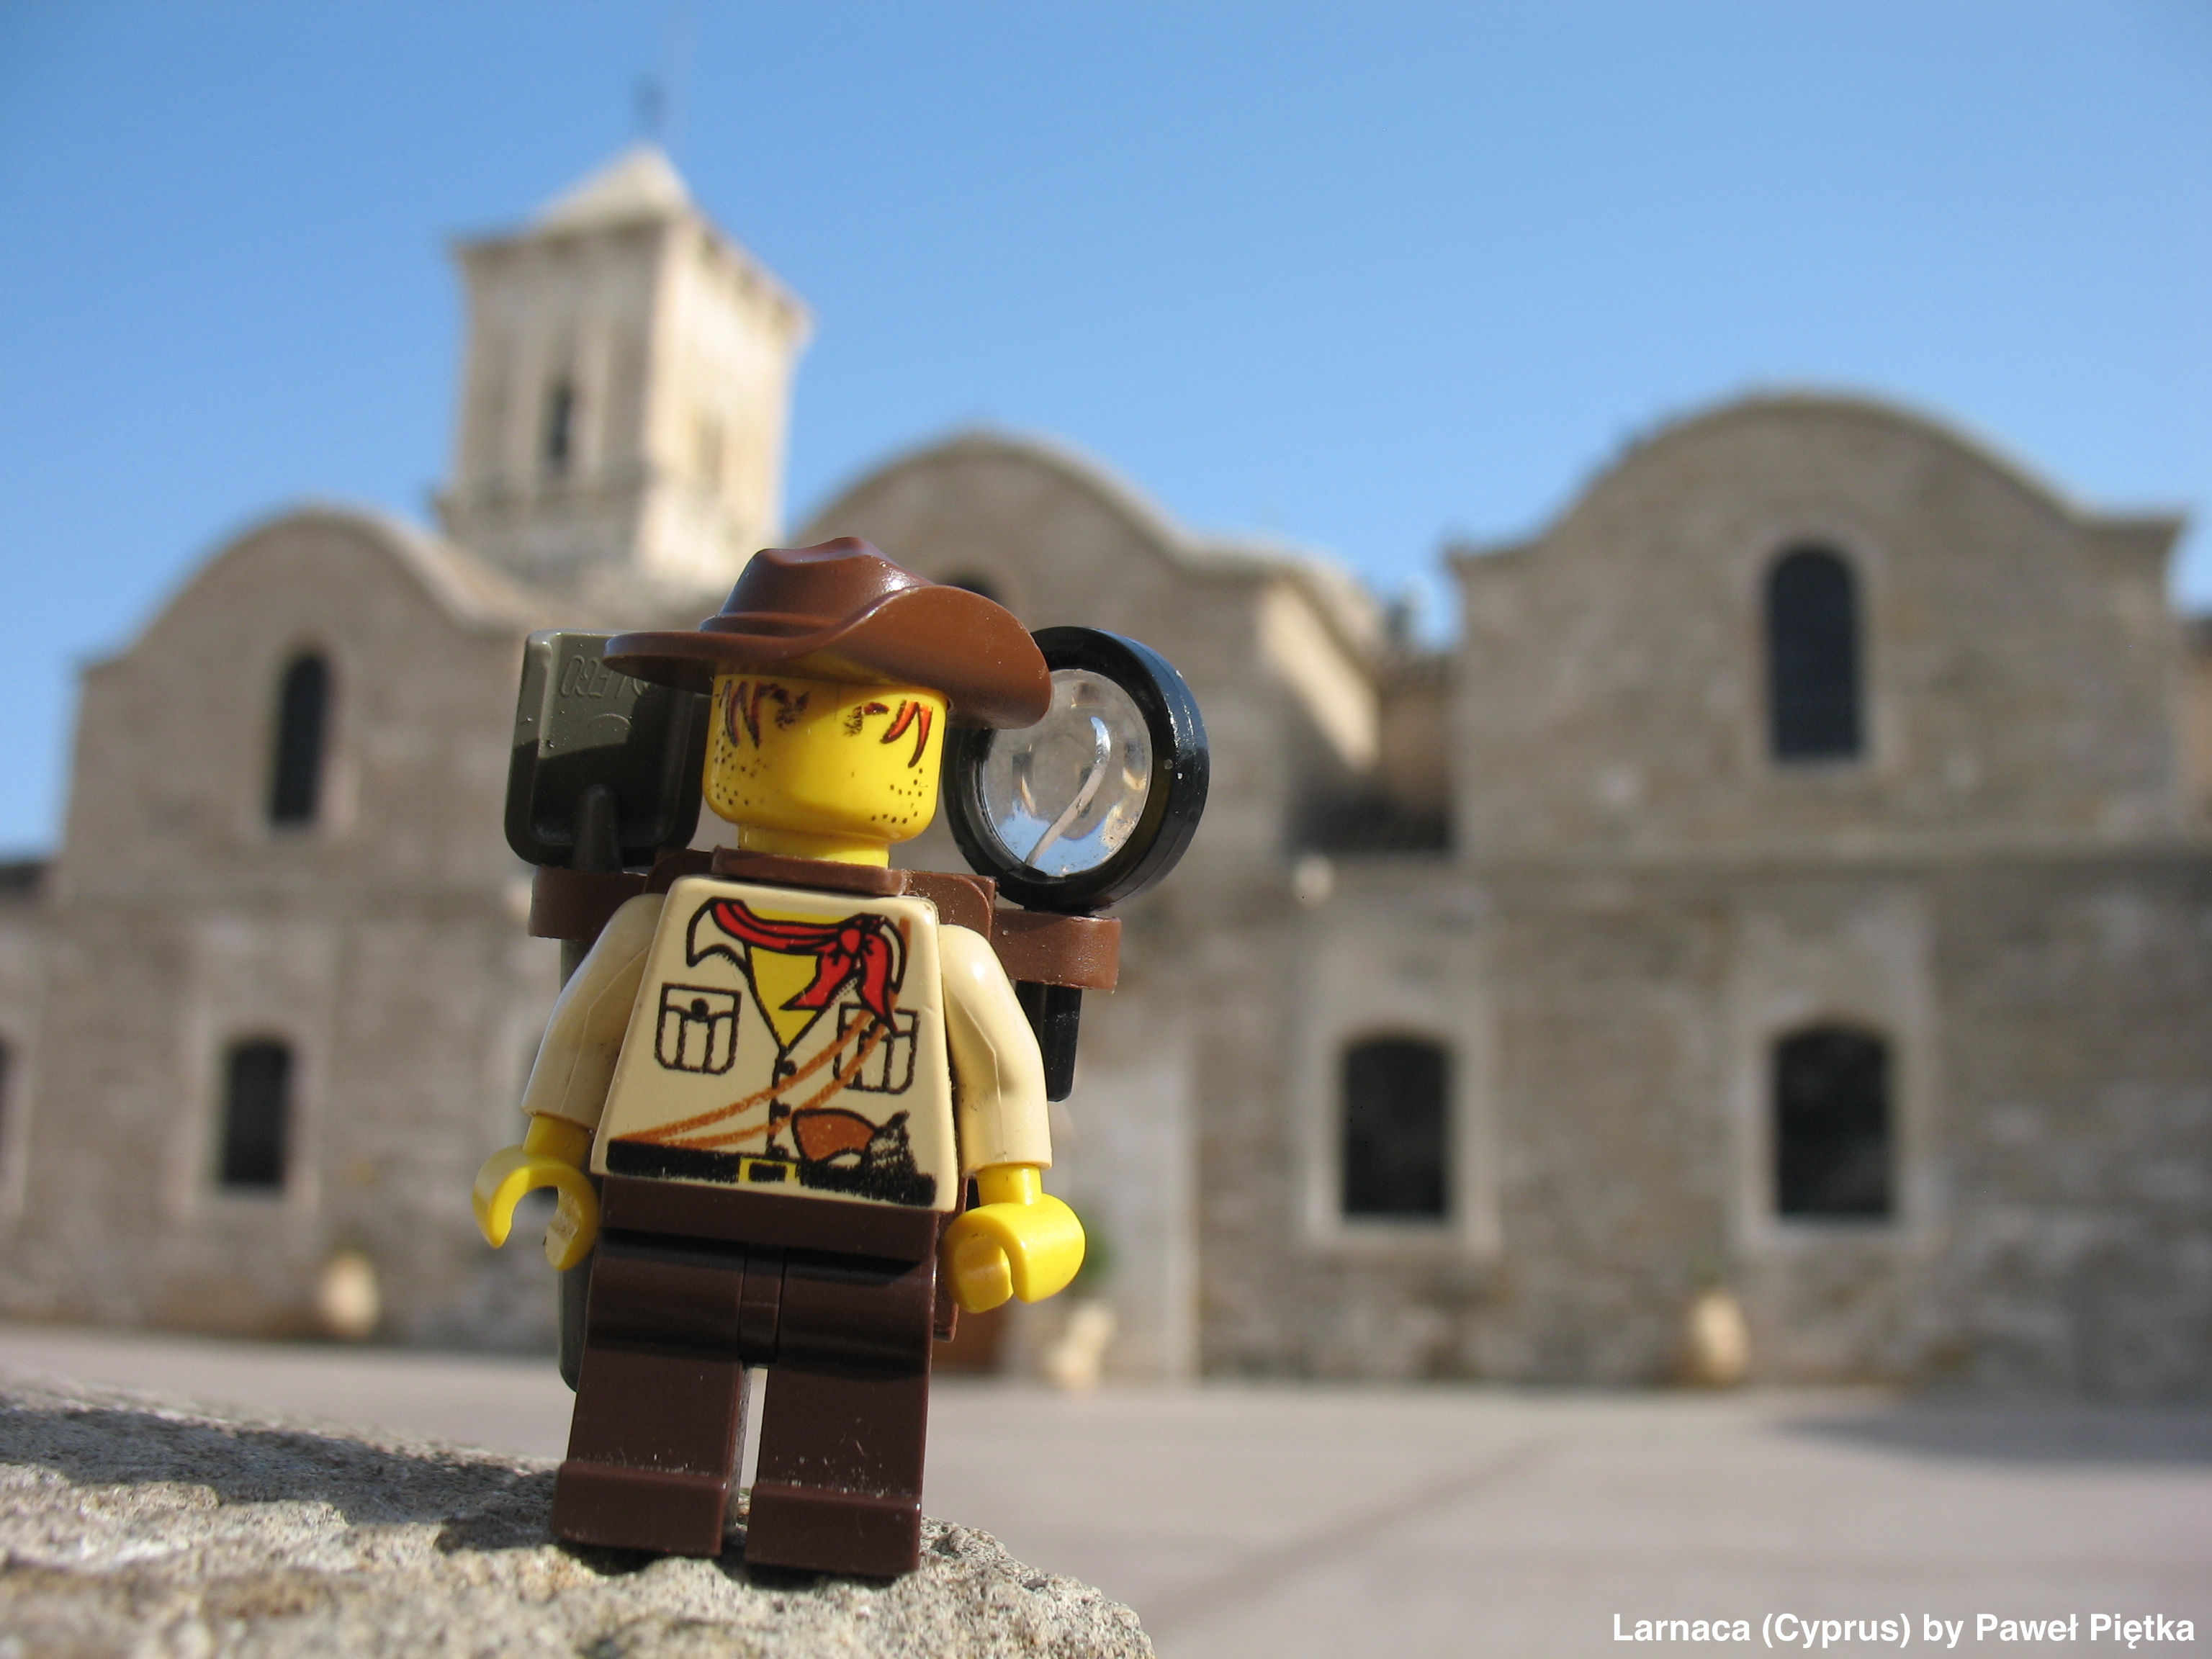 Larnaca (Cyprus) - Church of Saint Lazarus